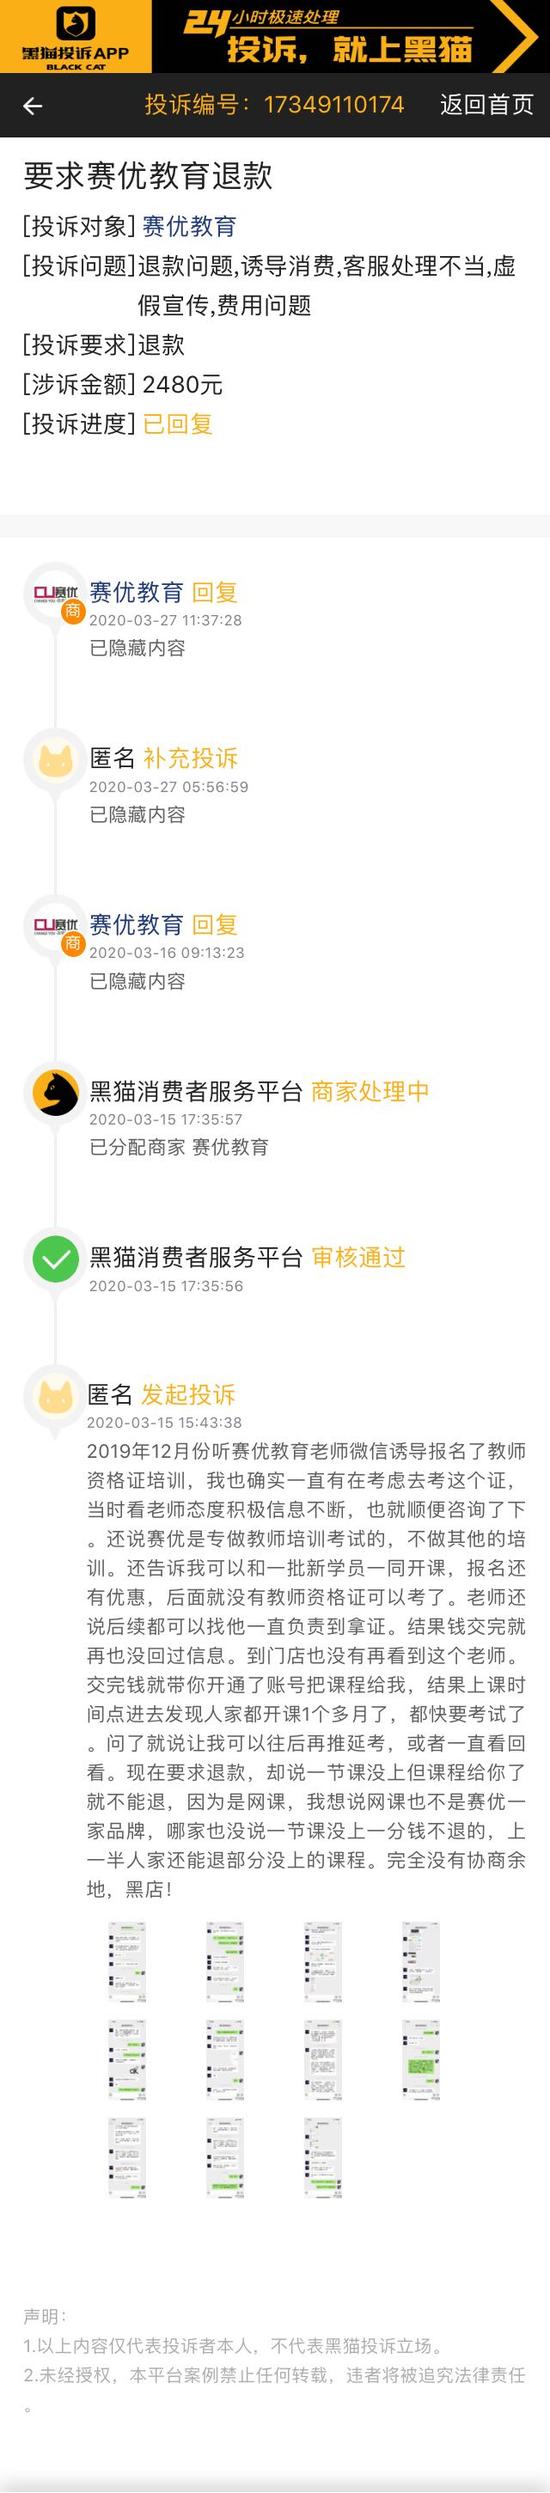 http://www.nowees.com/shehui/2087084.html